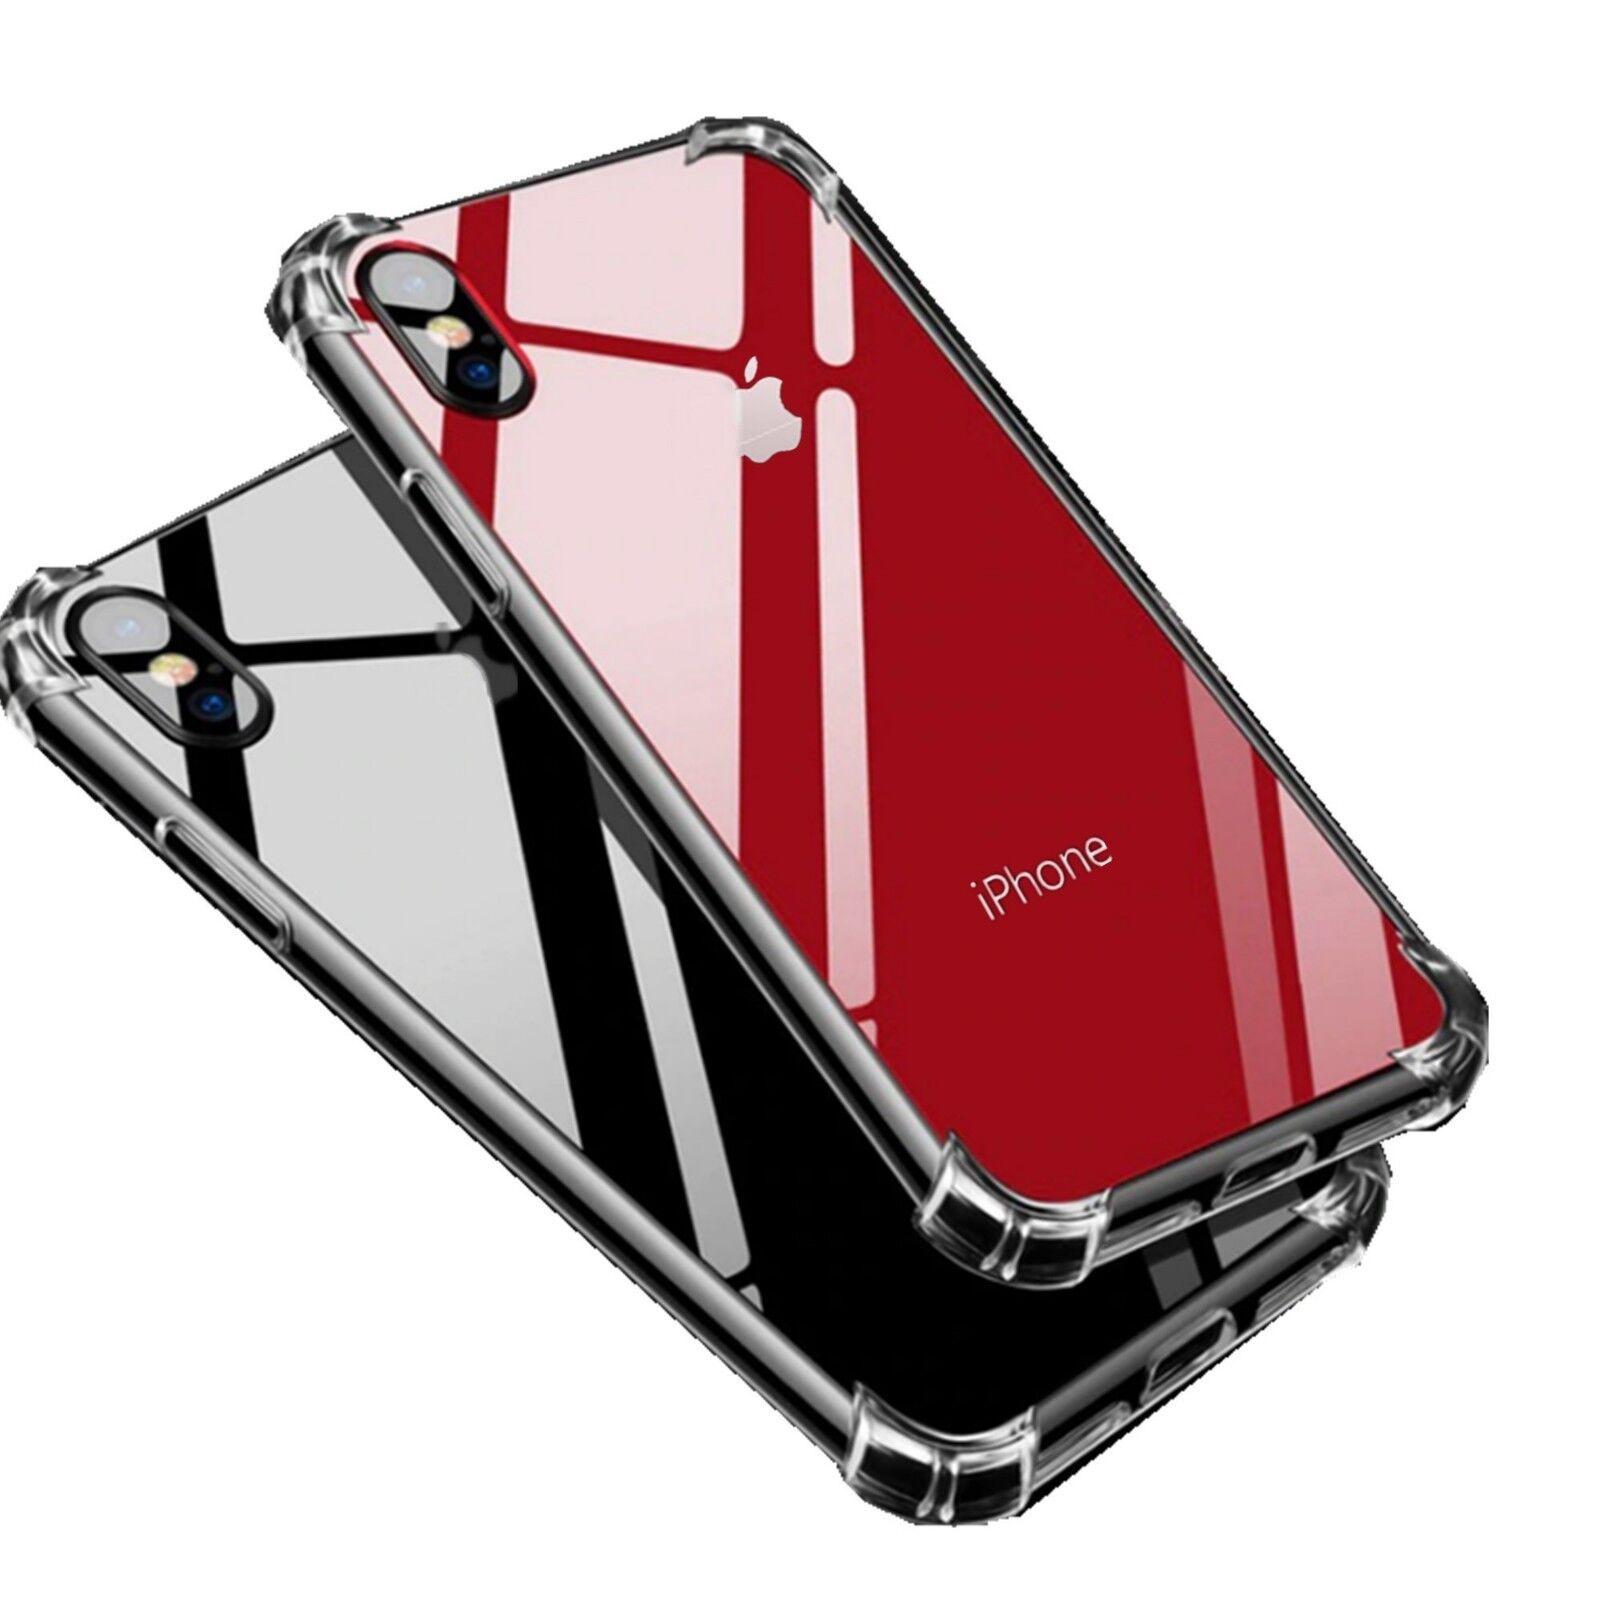 Купить Storm Buy - Hybrid Shockproof Thin Clear TPU Bumper Case Fits iPhone